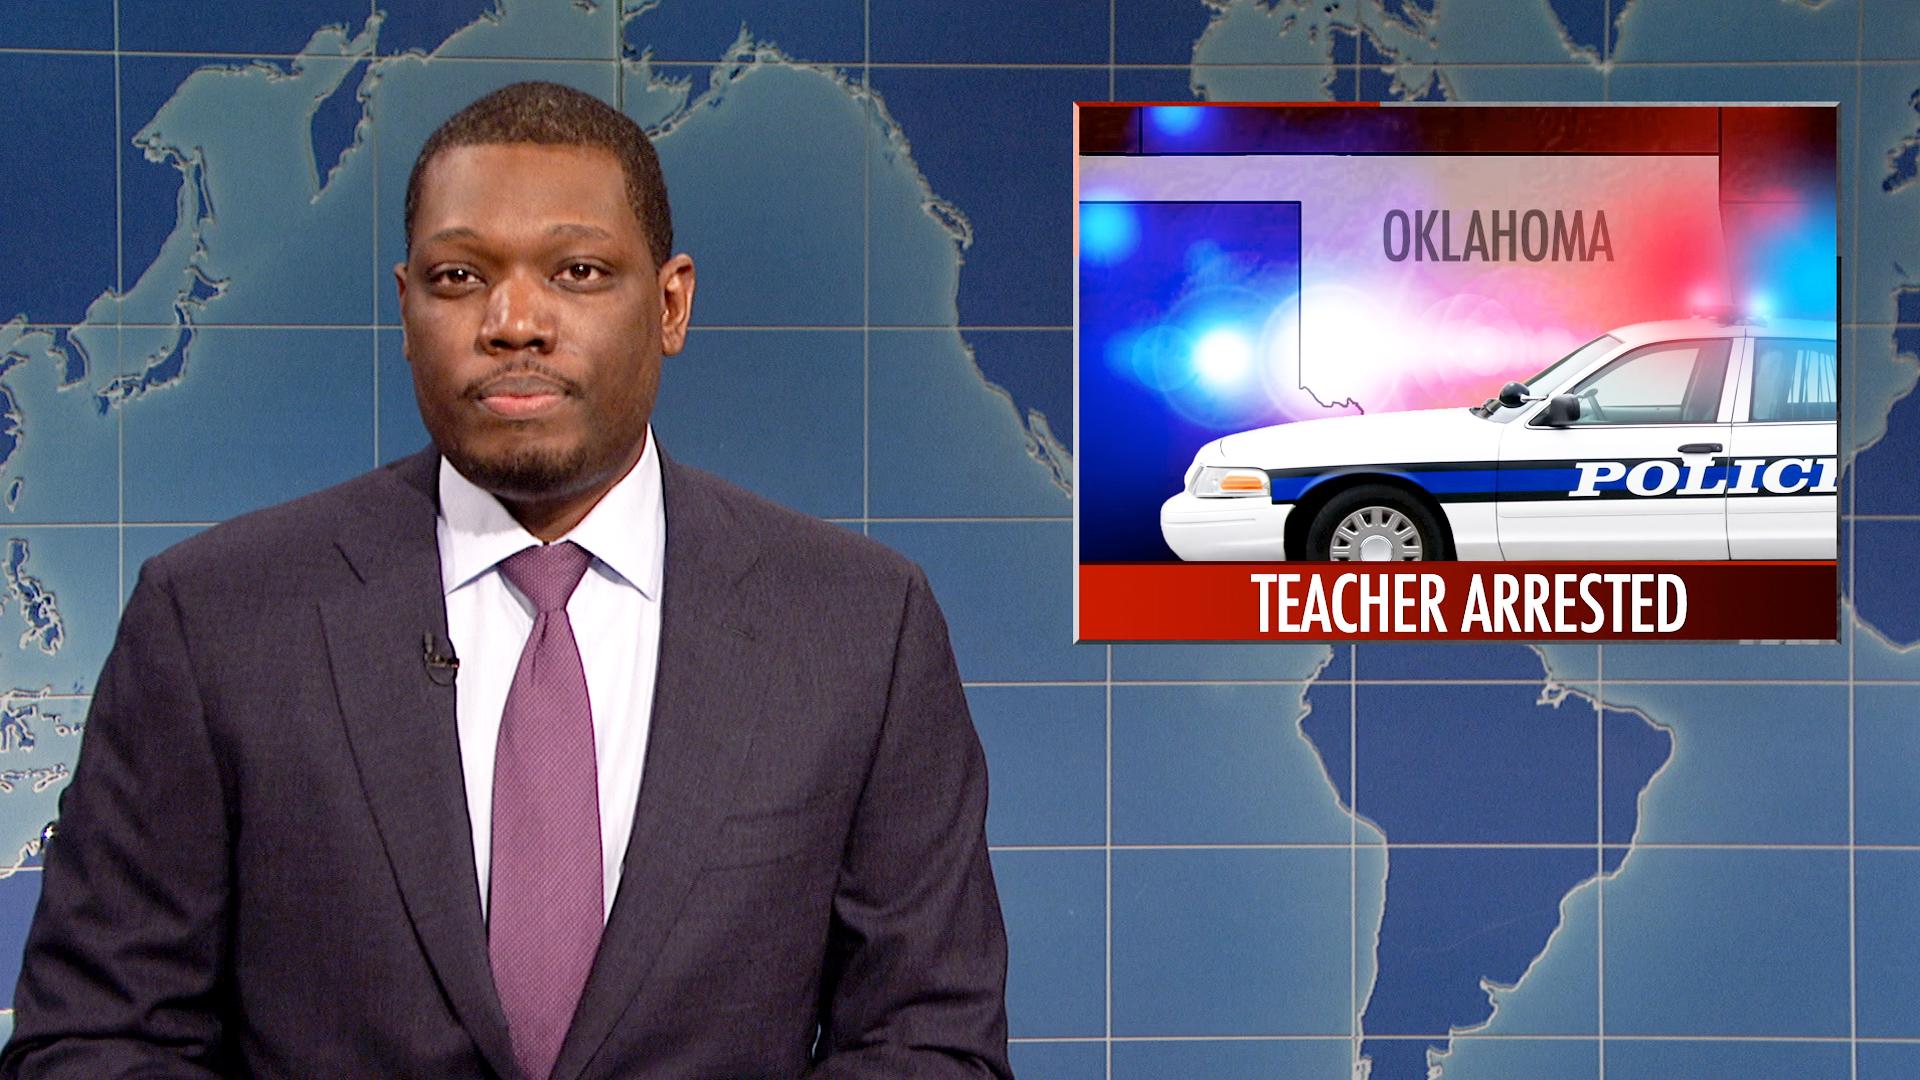 Watch Weekend Update on Oklahoma Teacher's Arrest From ...